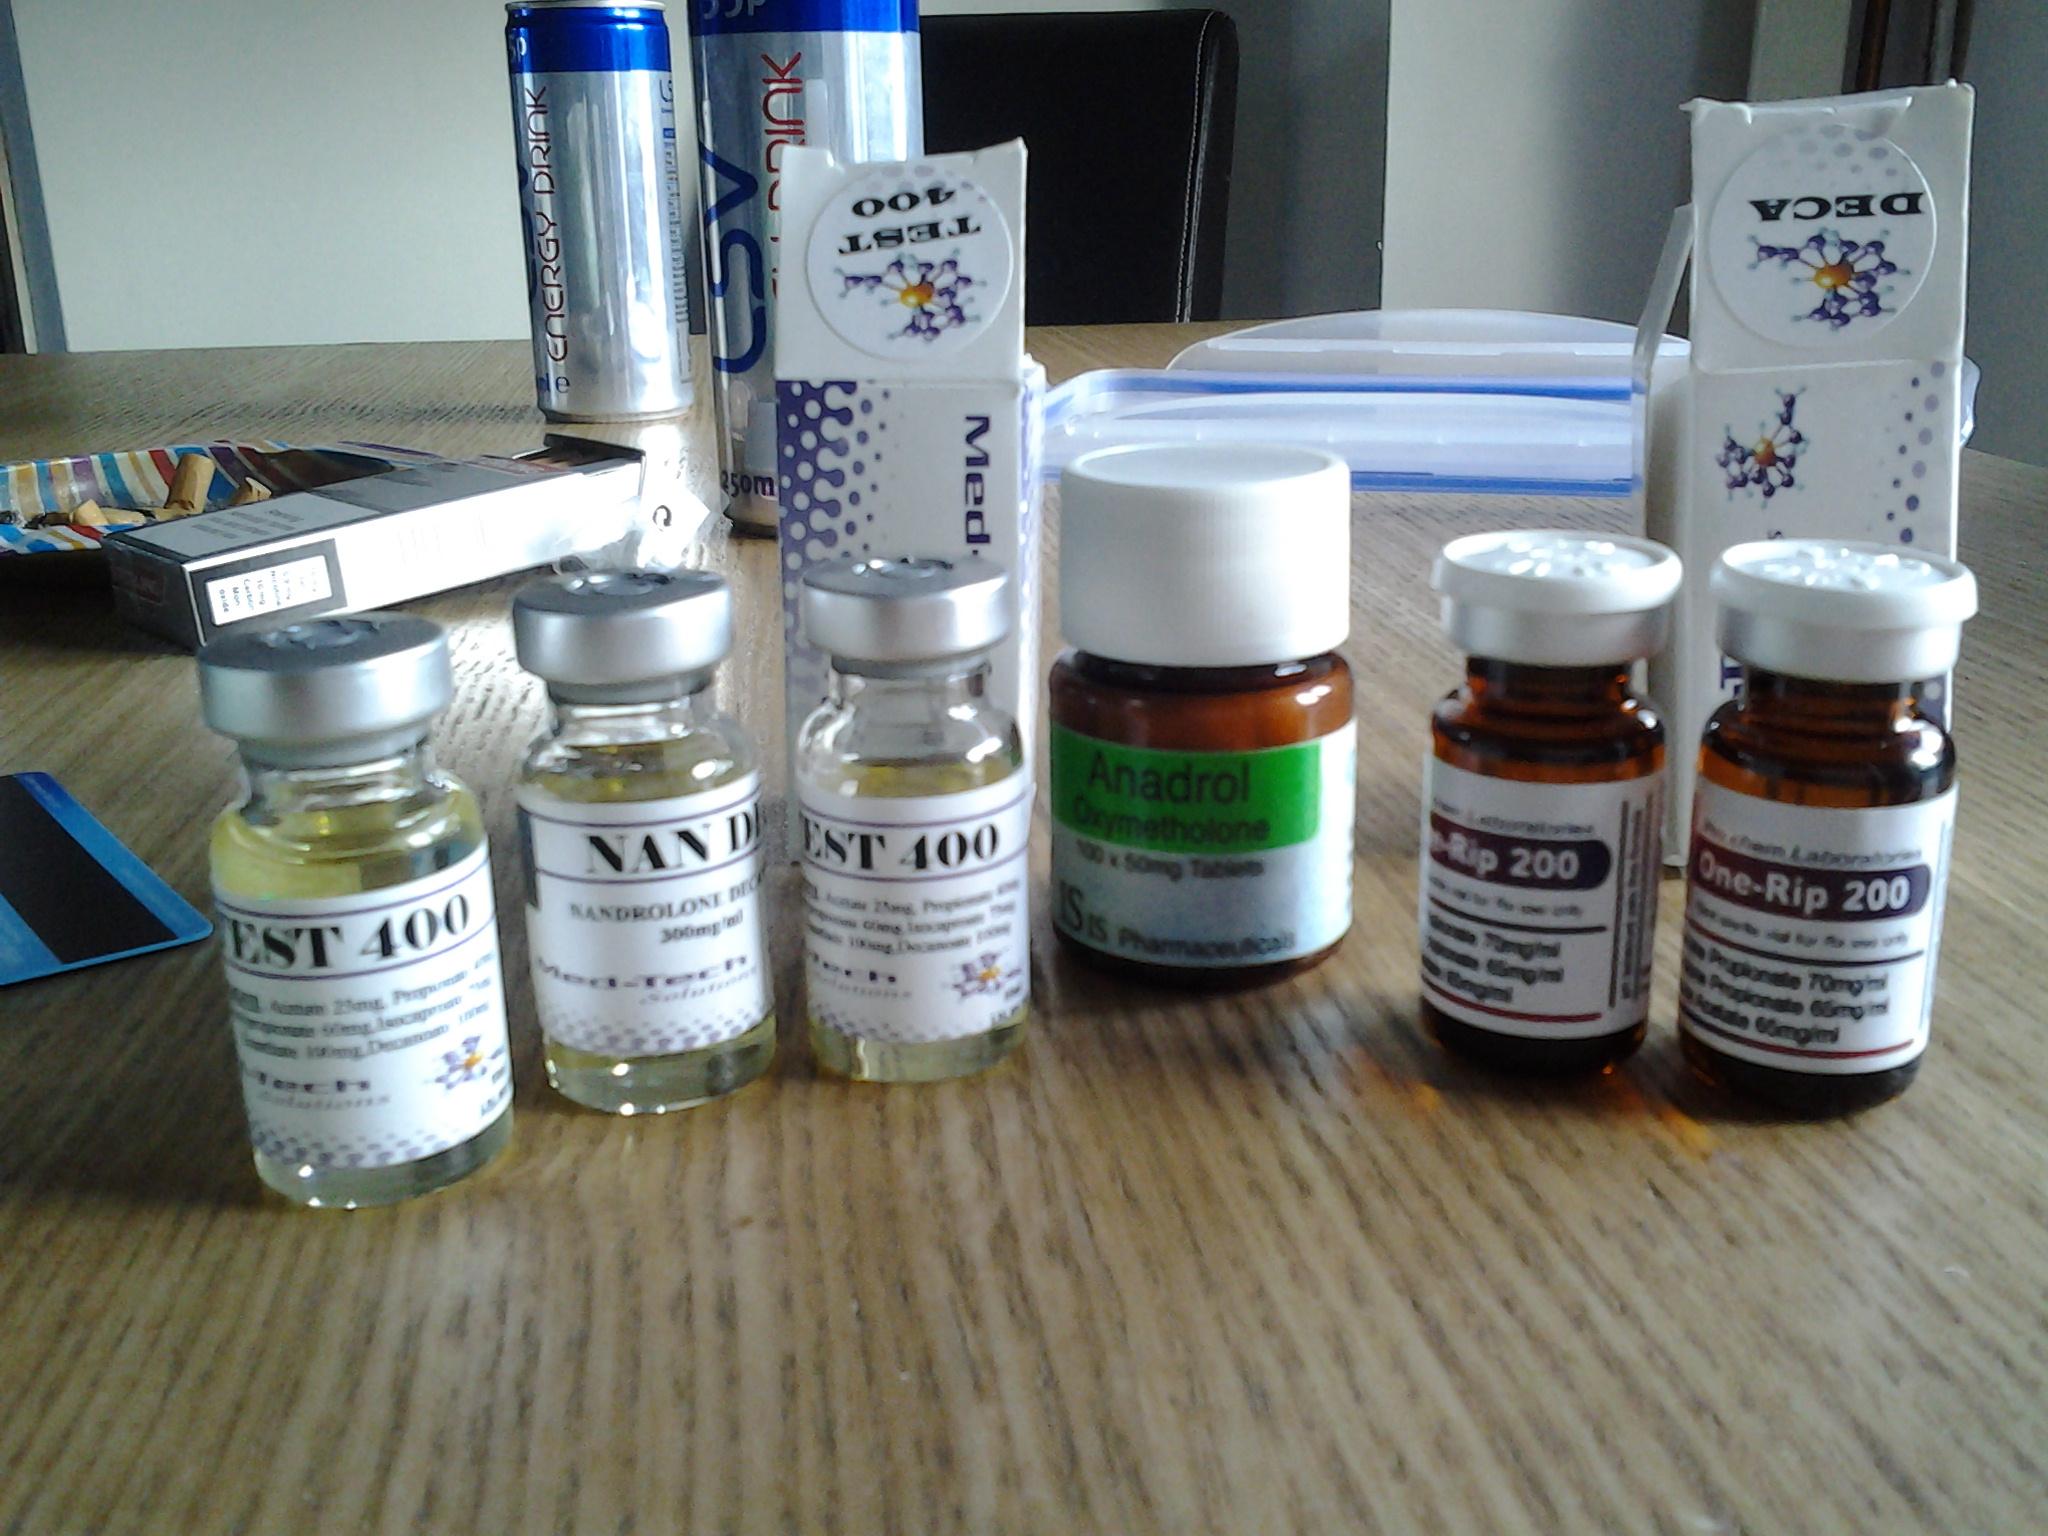 pro chem steroids test 400